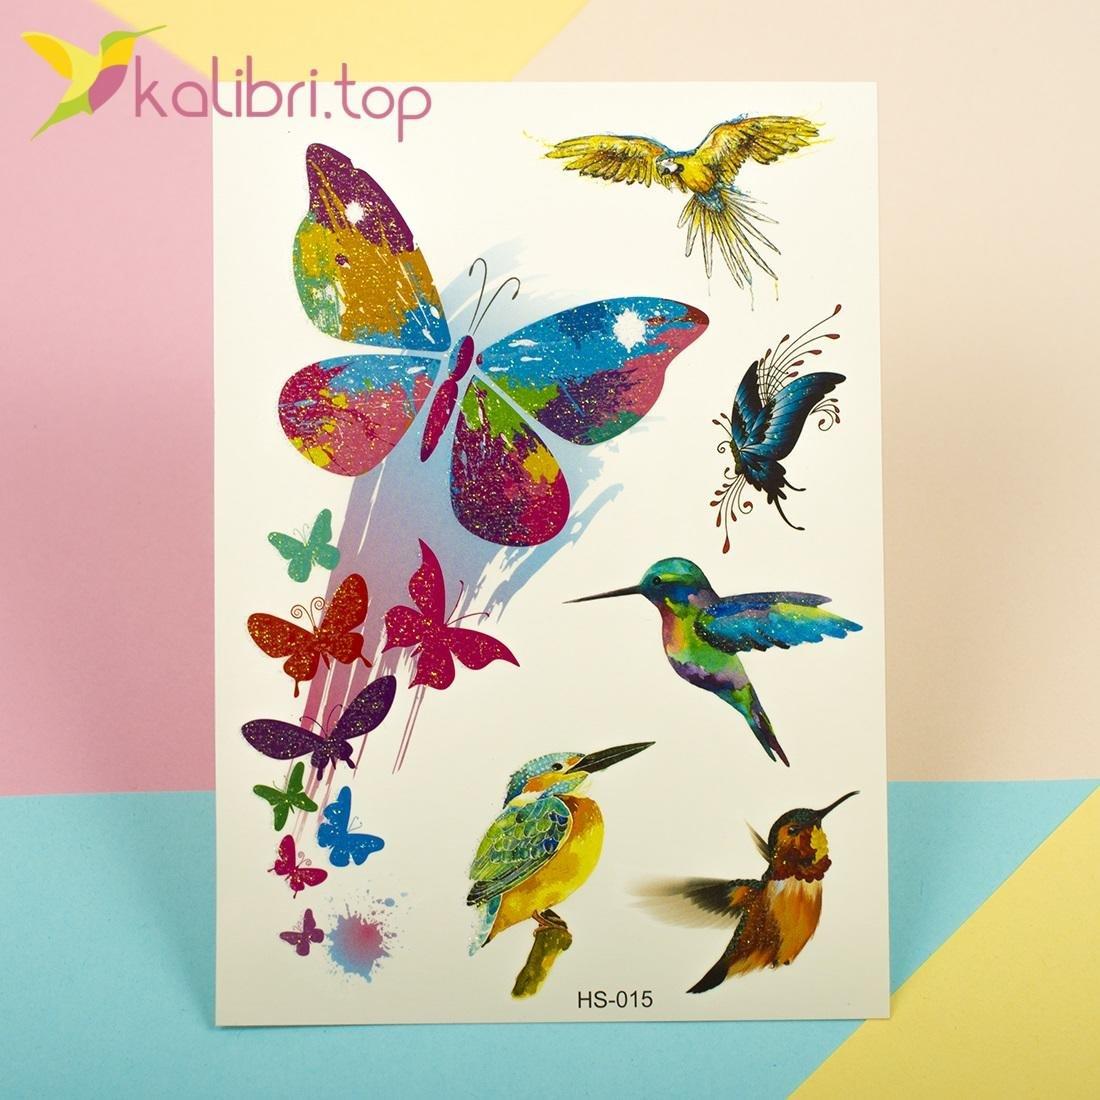 Татуировки с блесточками - колибри и бабочки оптом фото 1